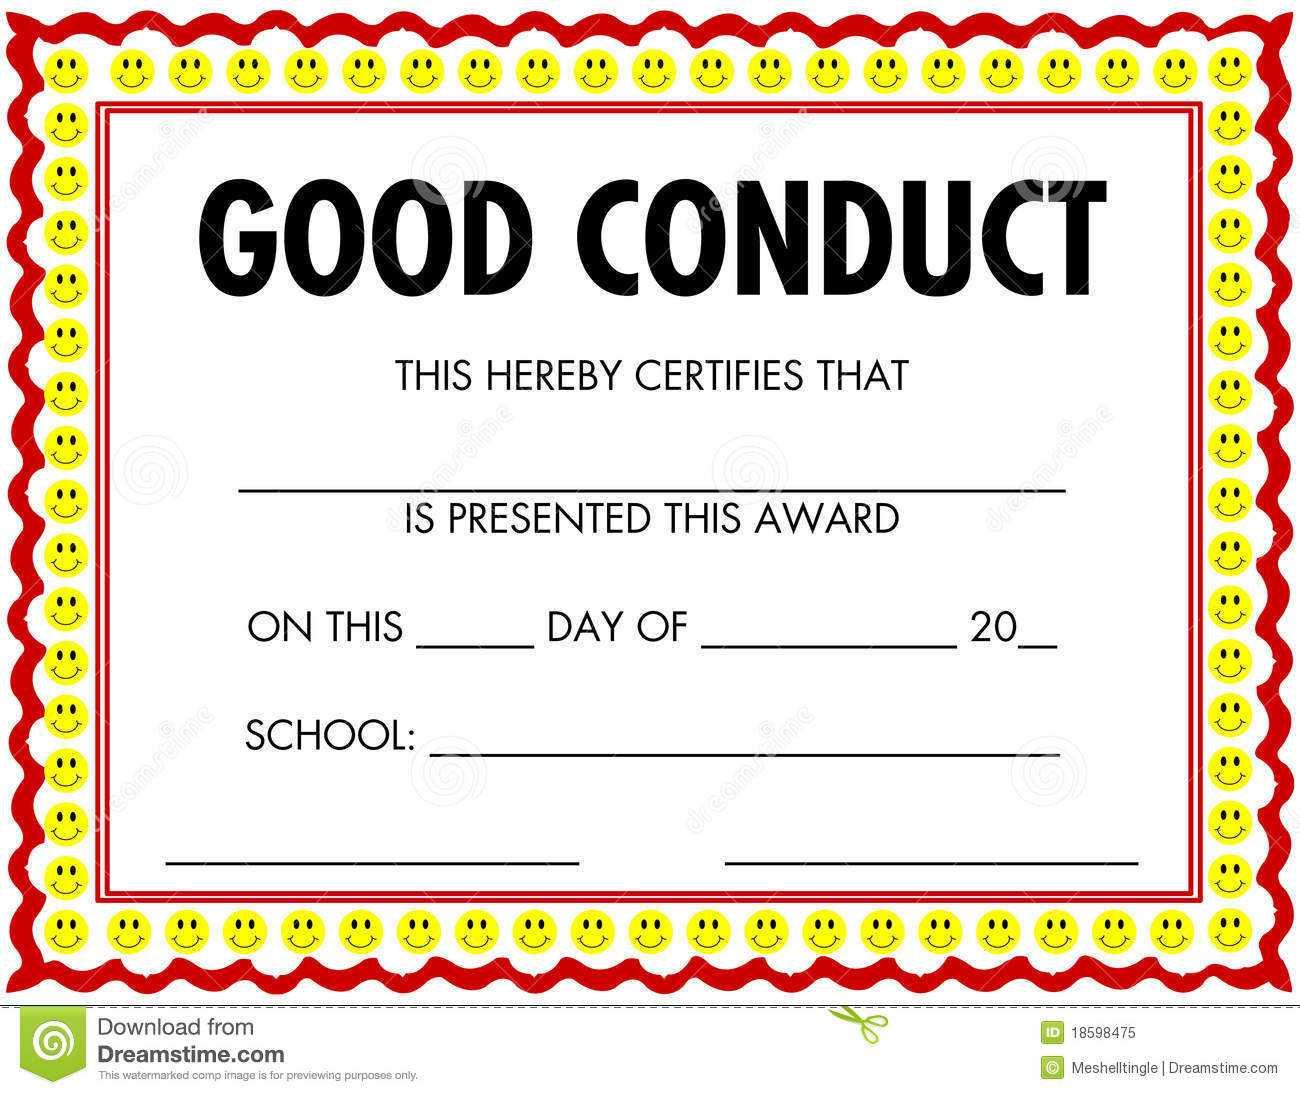 Award Certificate Good Conduct Stock Vector - Illustration Inside Good Conduct Certificate Template